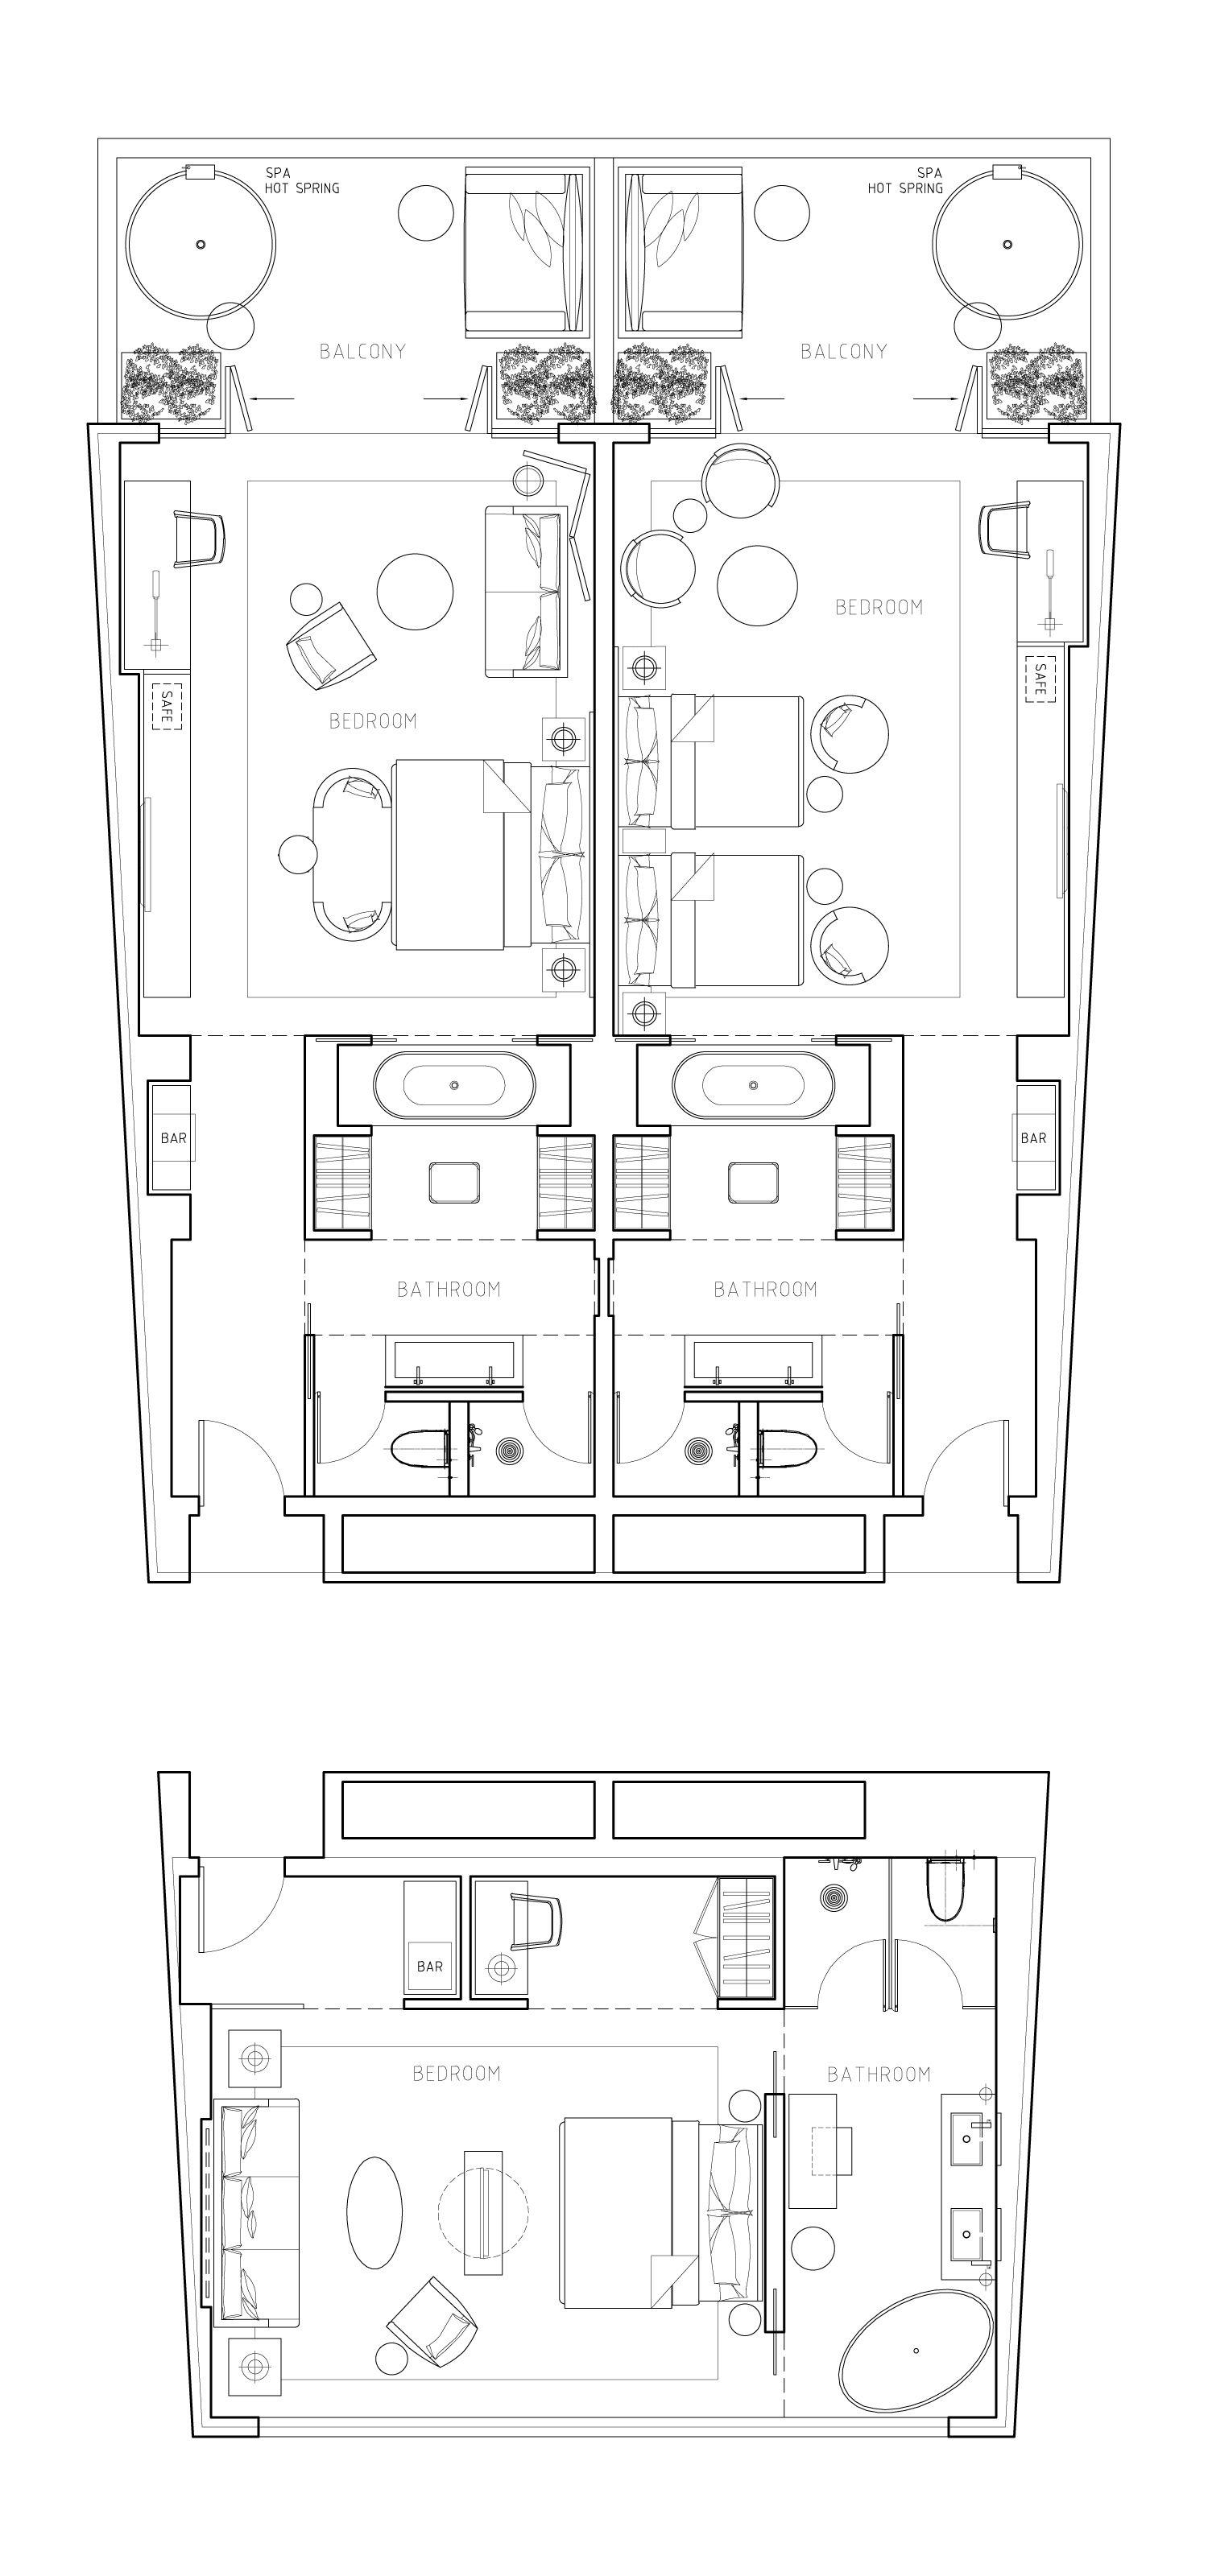 pin by nguyen atuan on pland room hotel room design floor plan rh pinterest com